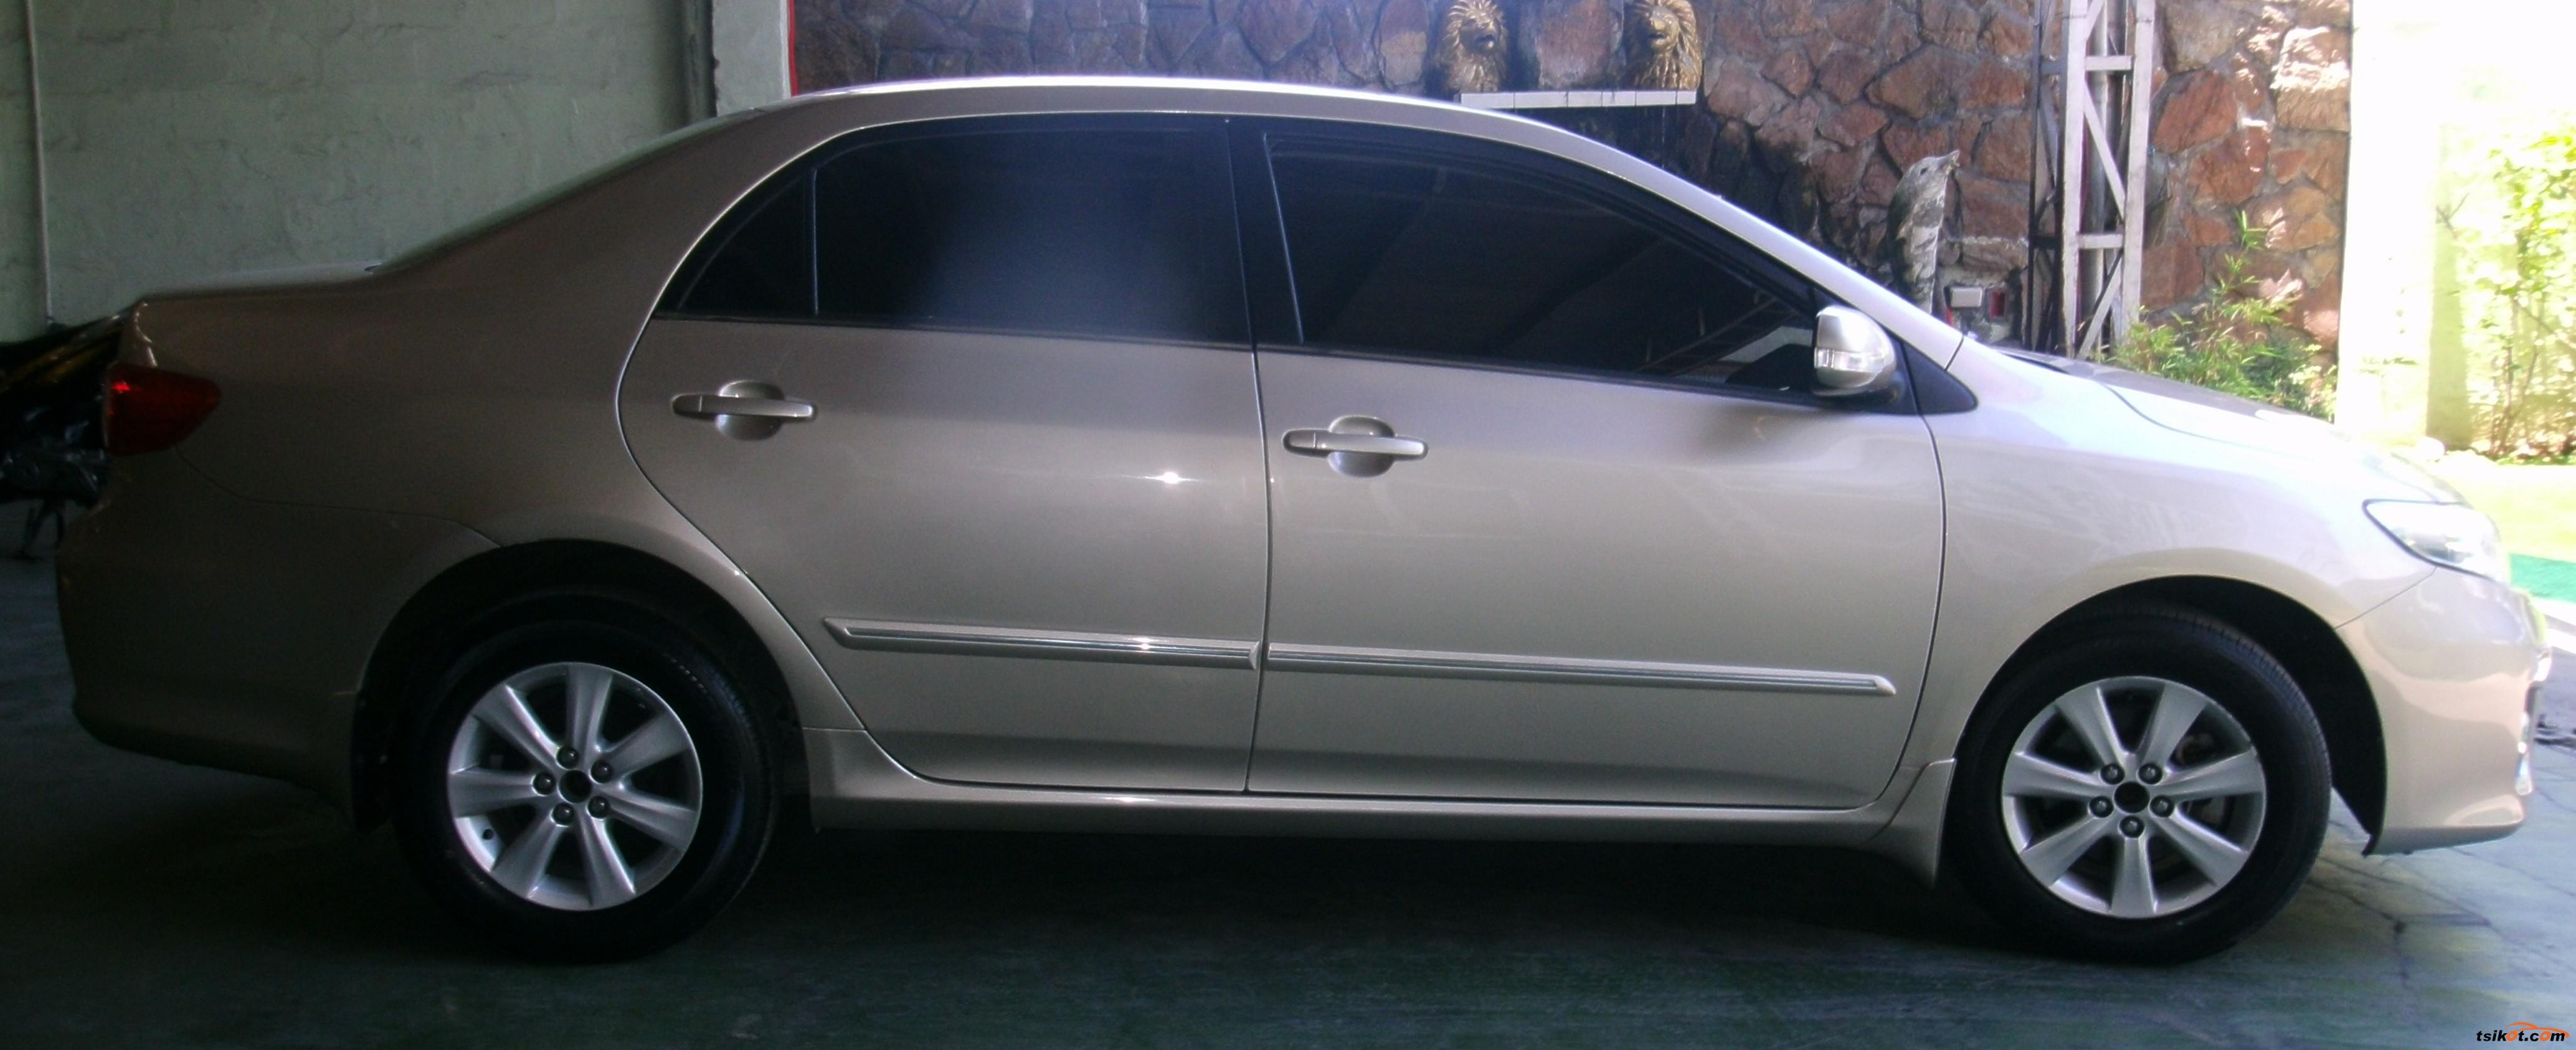 Nissan Sentra 2015 - 1